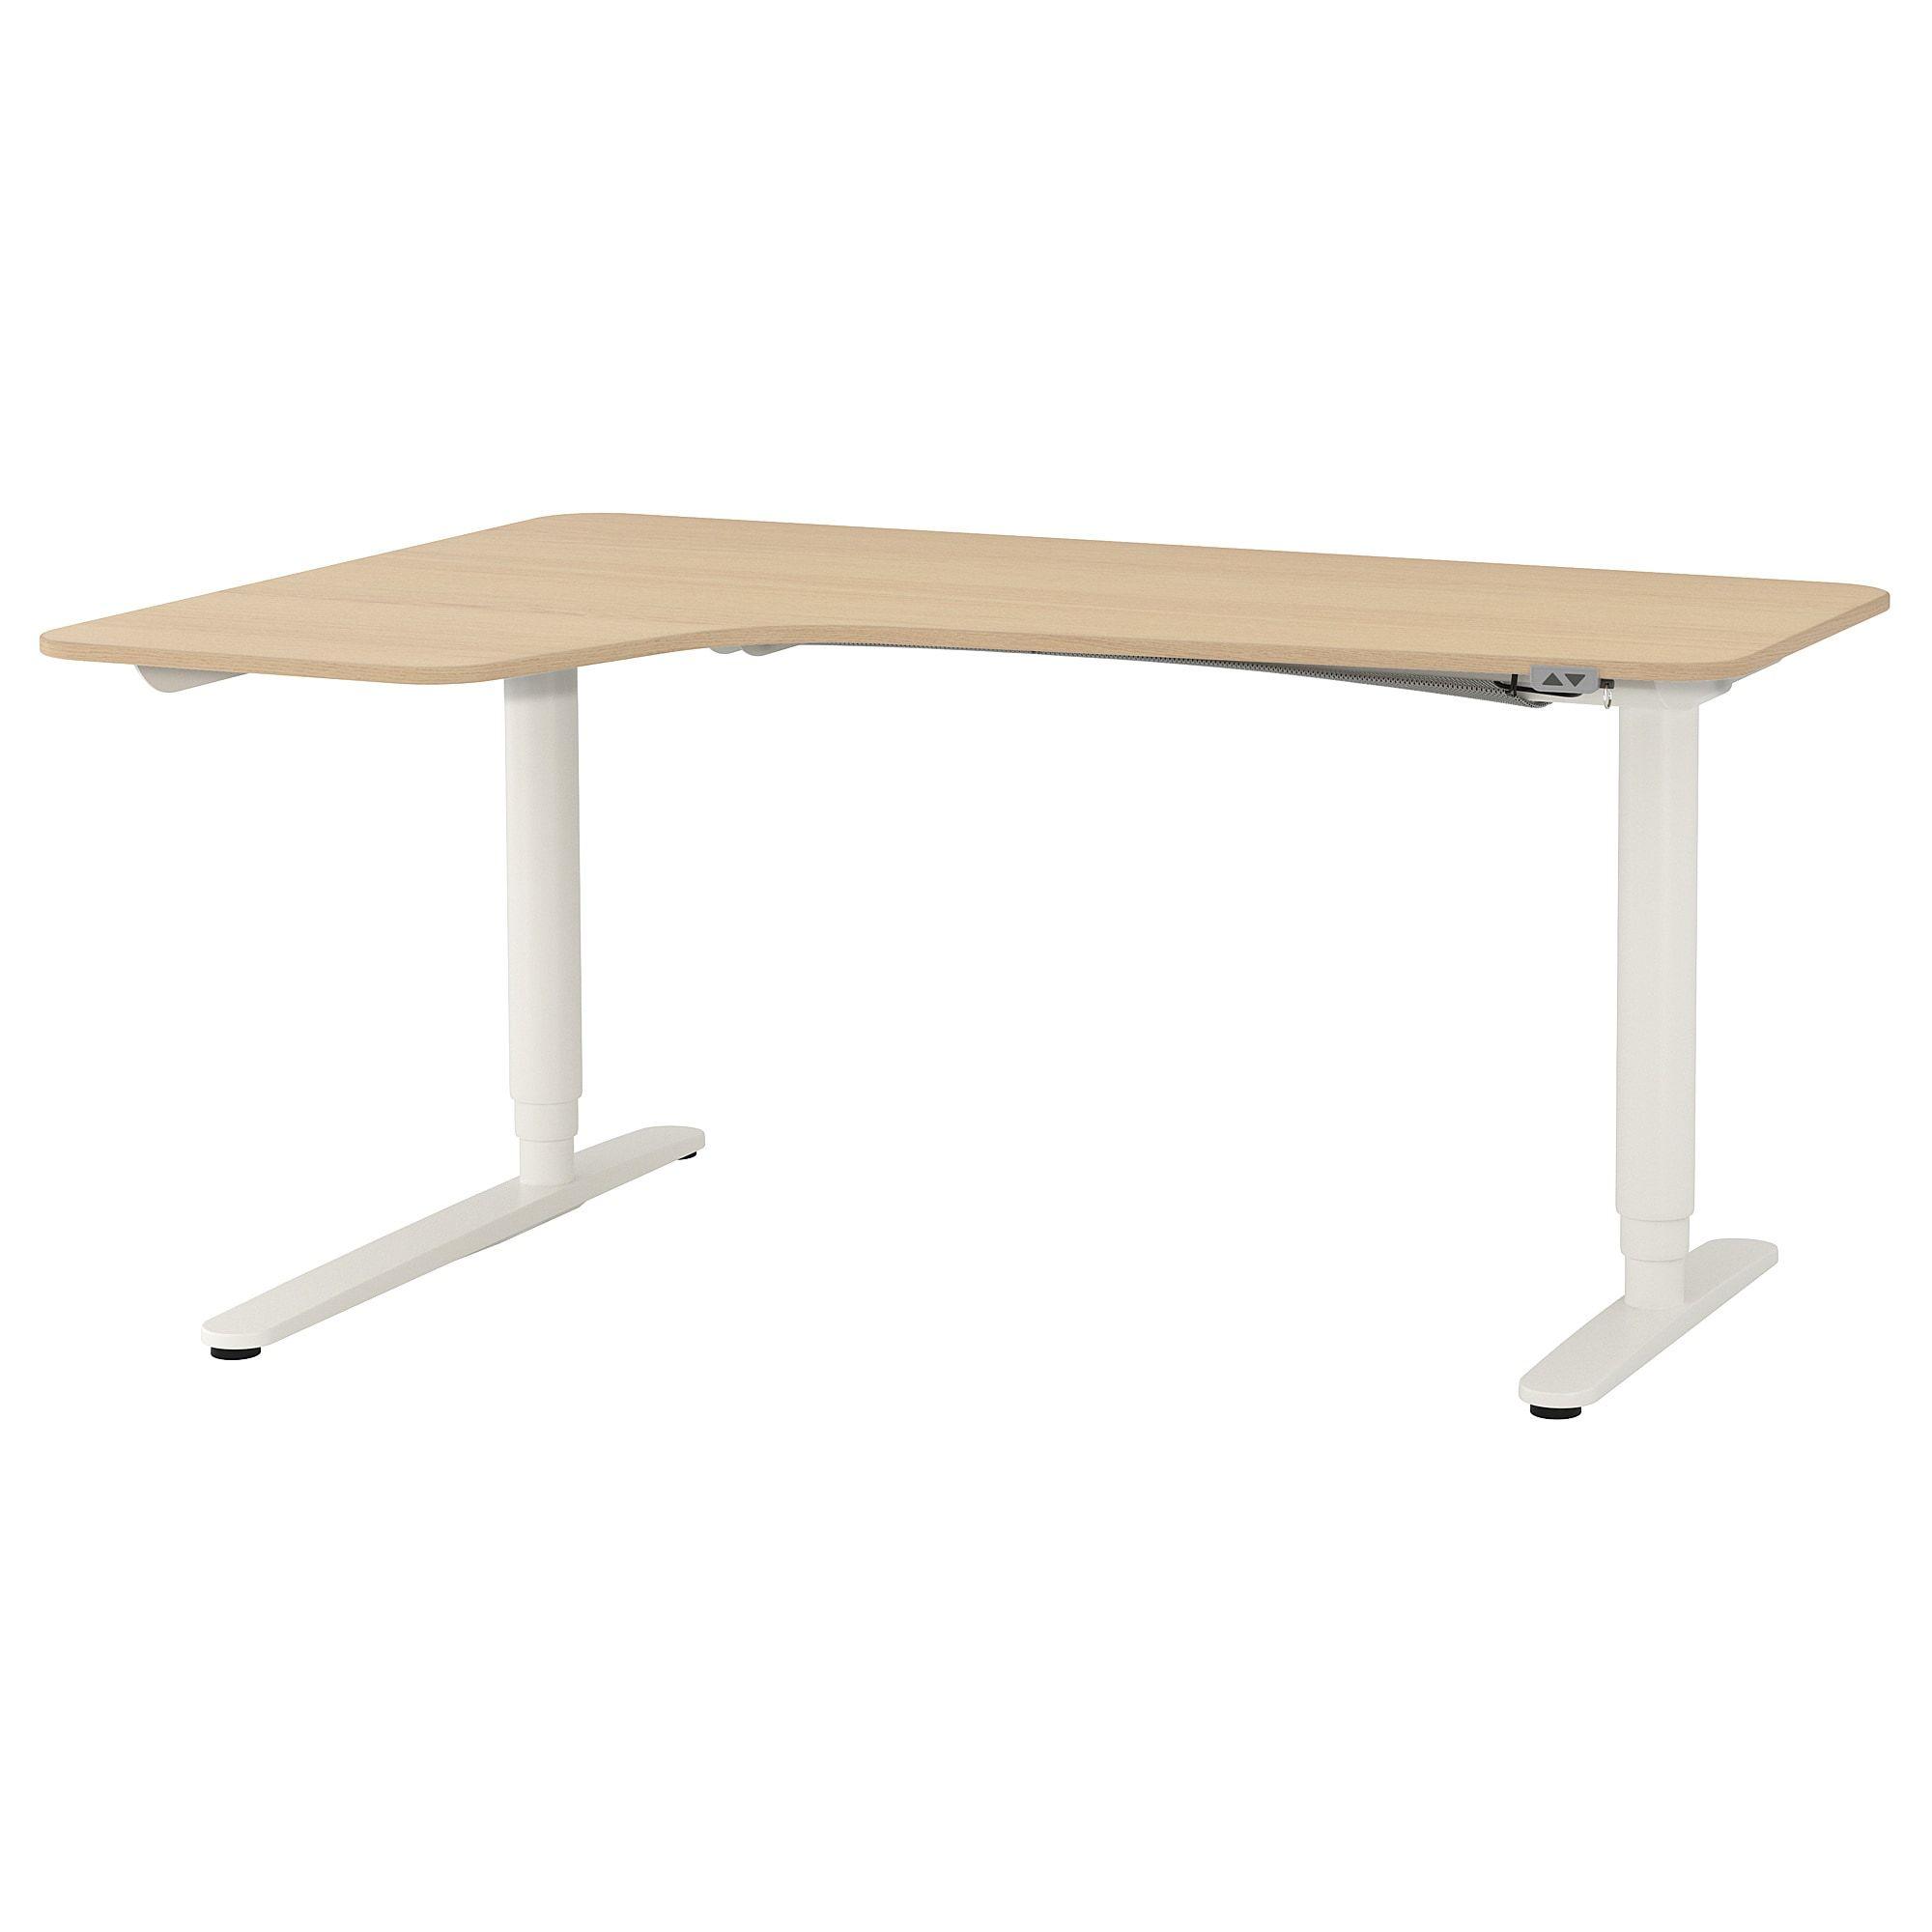 Ikea Bekant Corner Desk Left Sit Stand White Stained Oak Veneer Ikea Ikea Bekant White Corner Desk